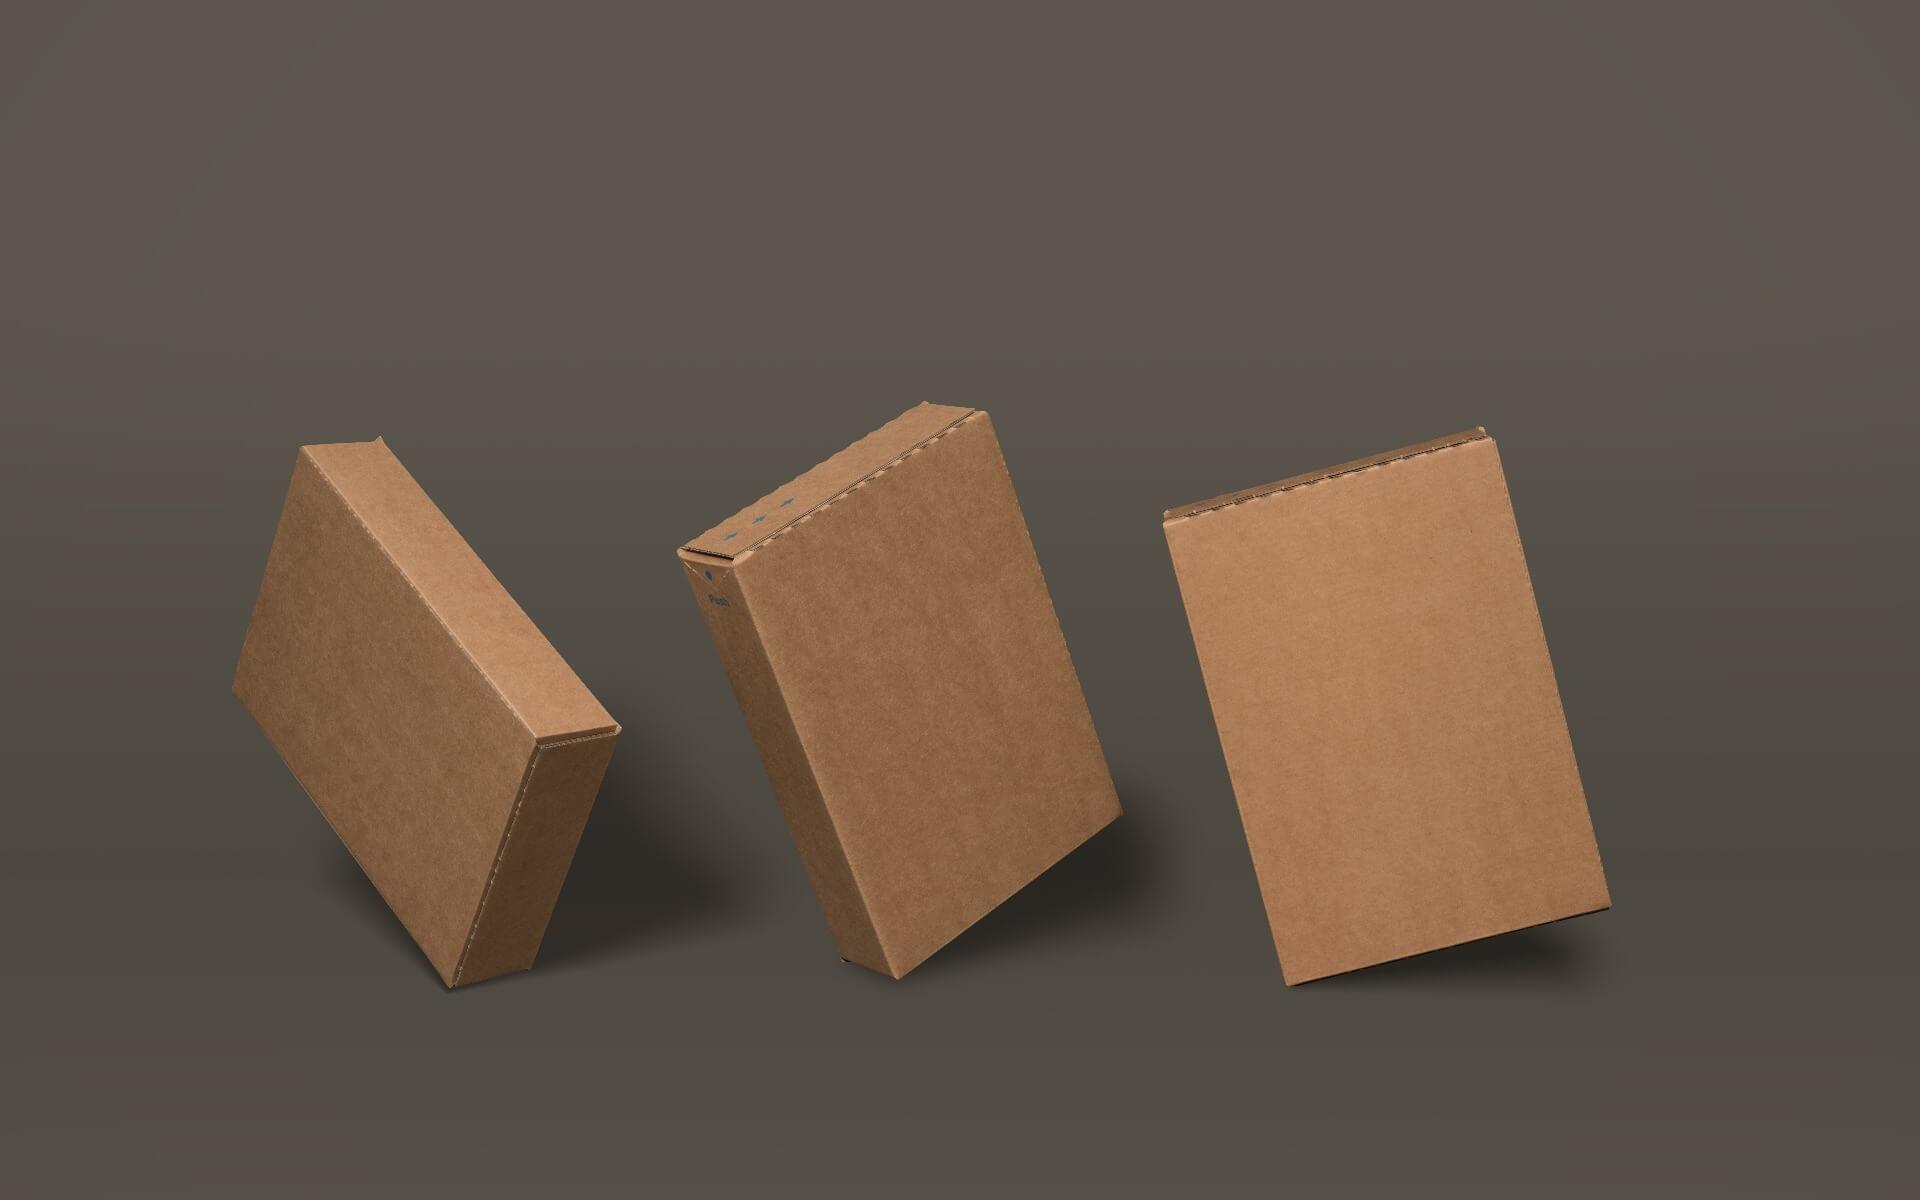 Slimline boxes